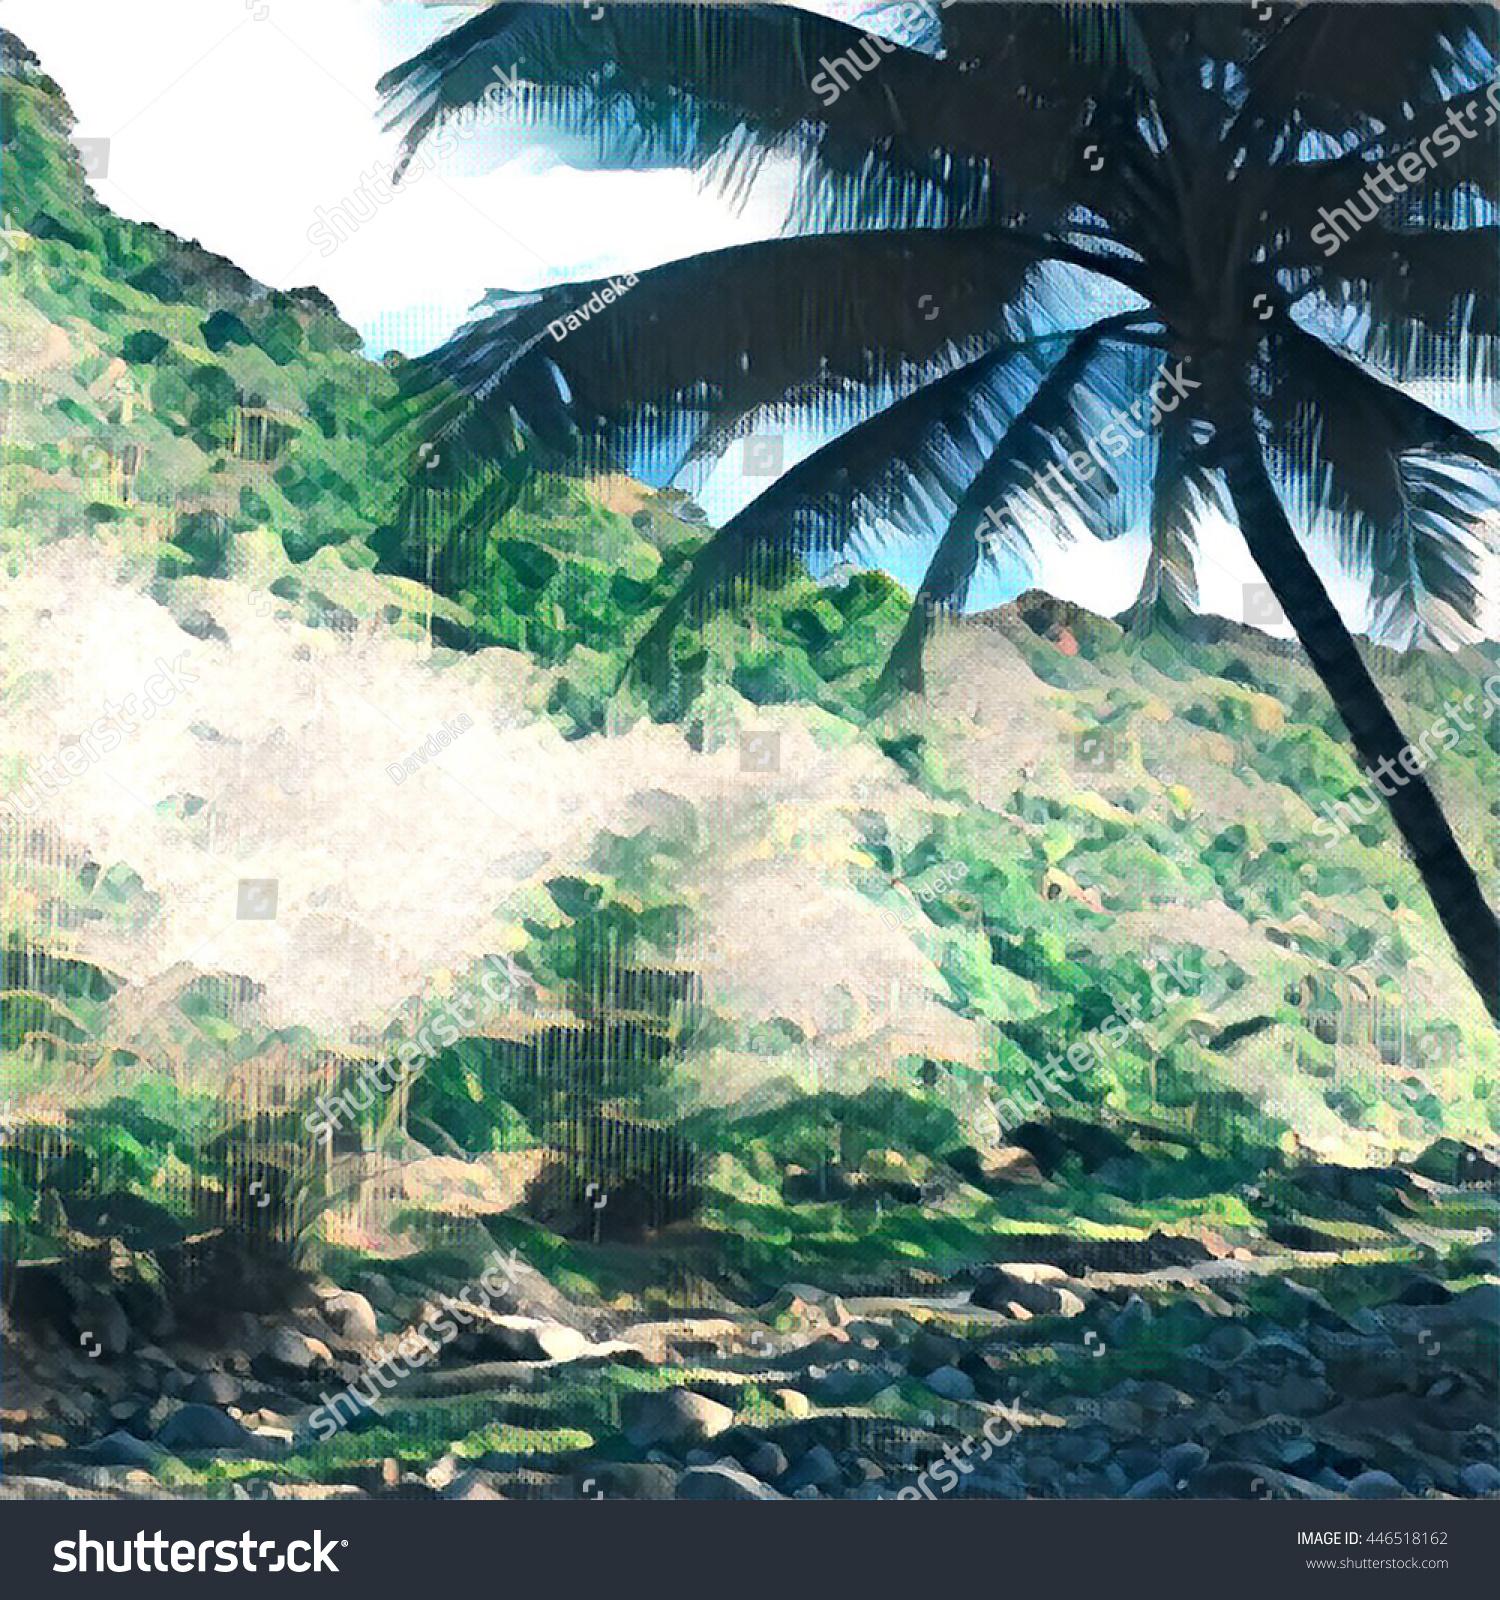 Digital Illustration Silhouette Coconut Palm Tree Stock Illustration ...